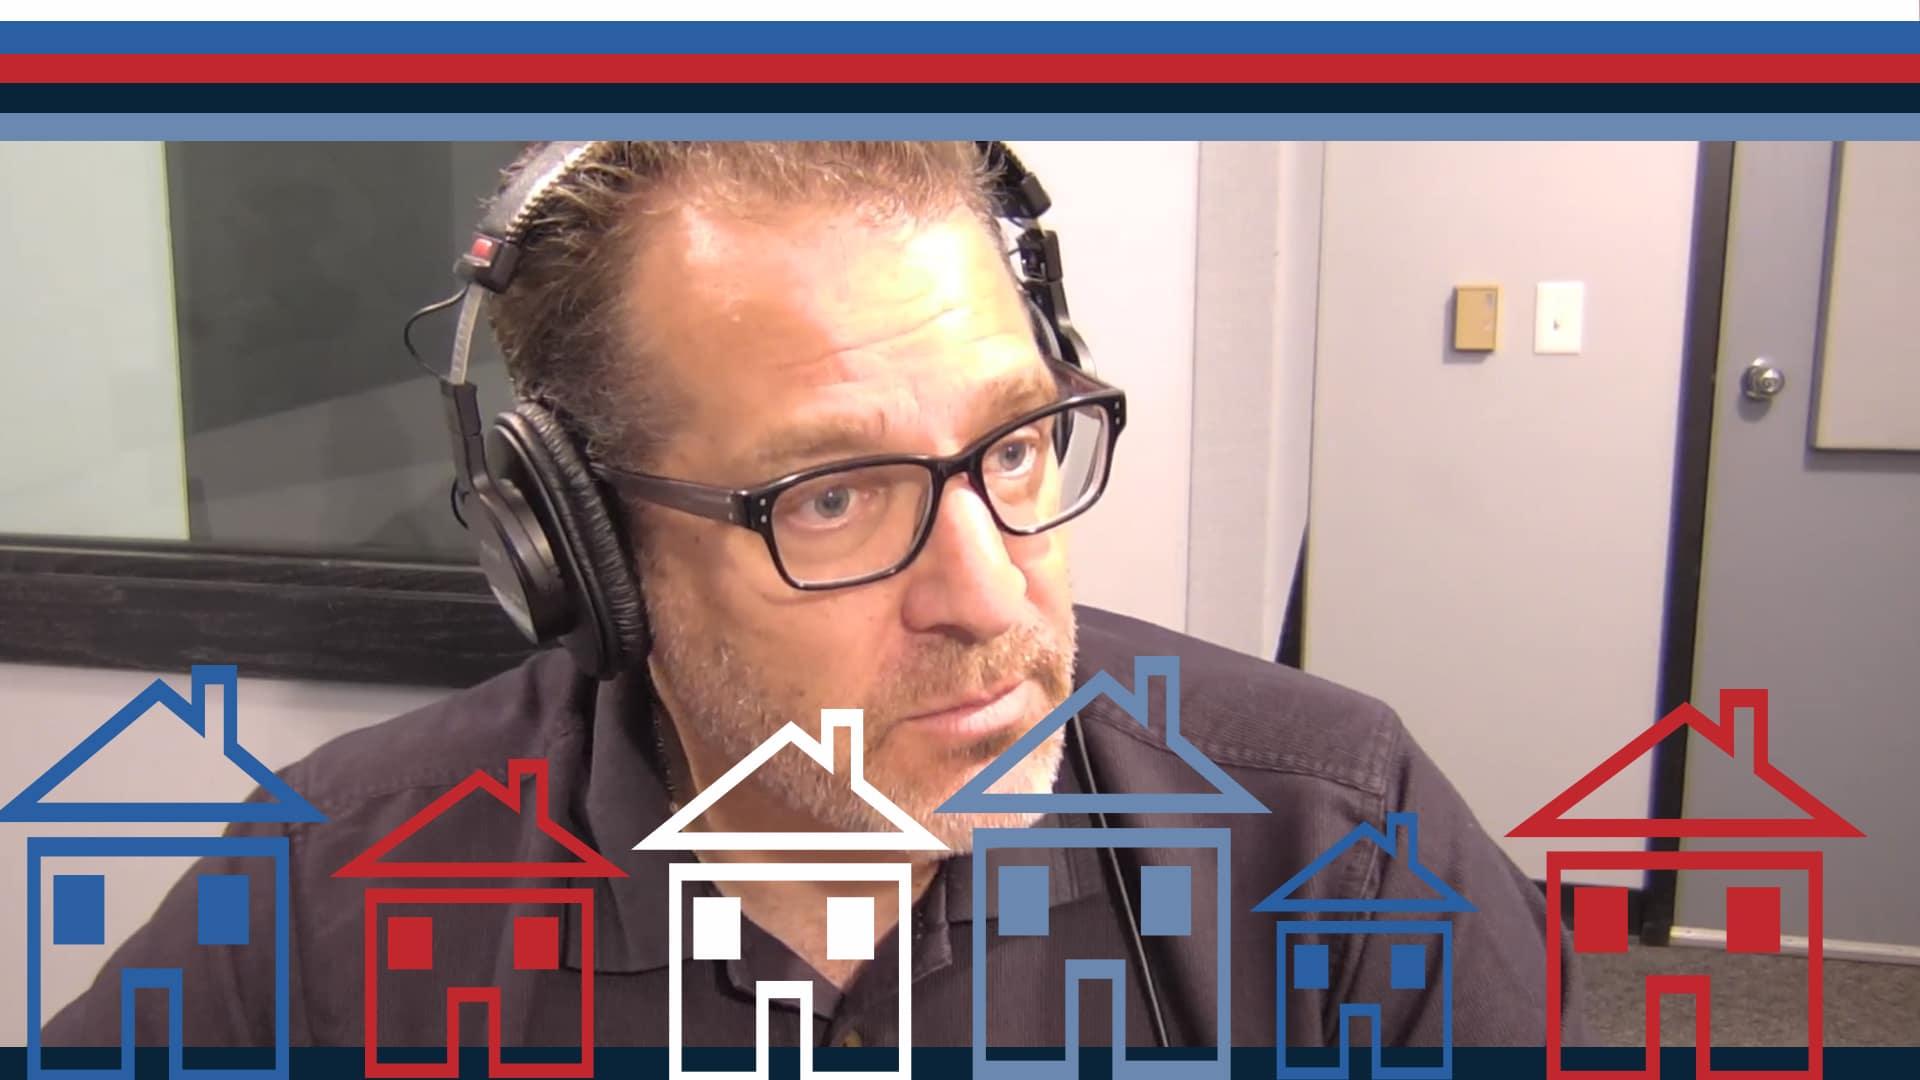 Real Estate Realities - Episode 3